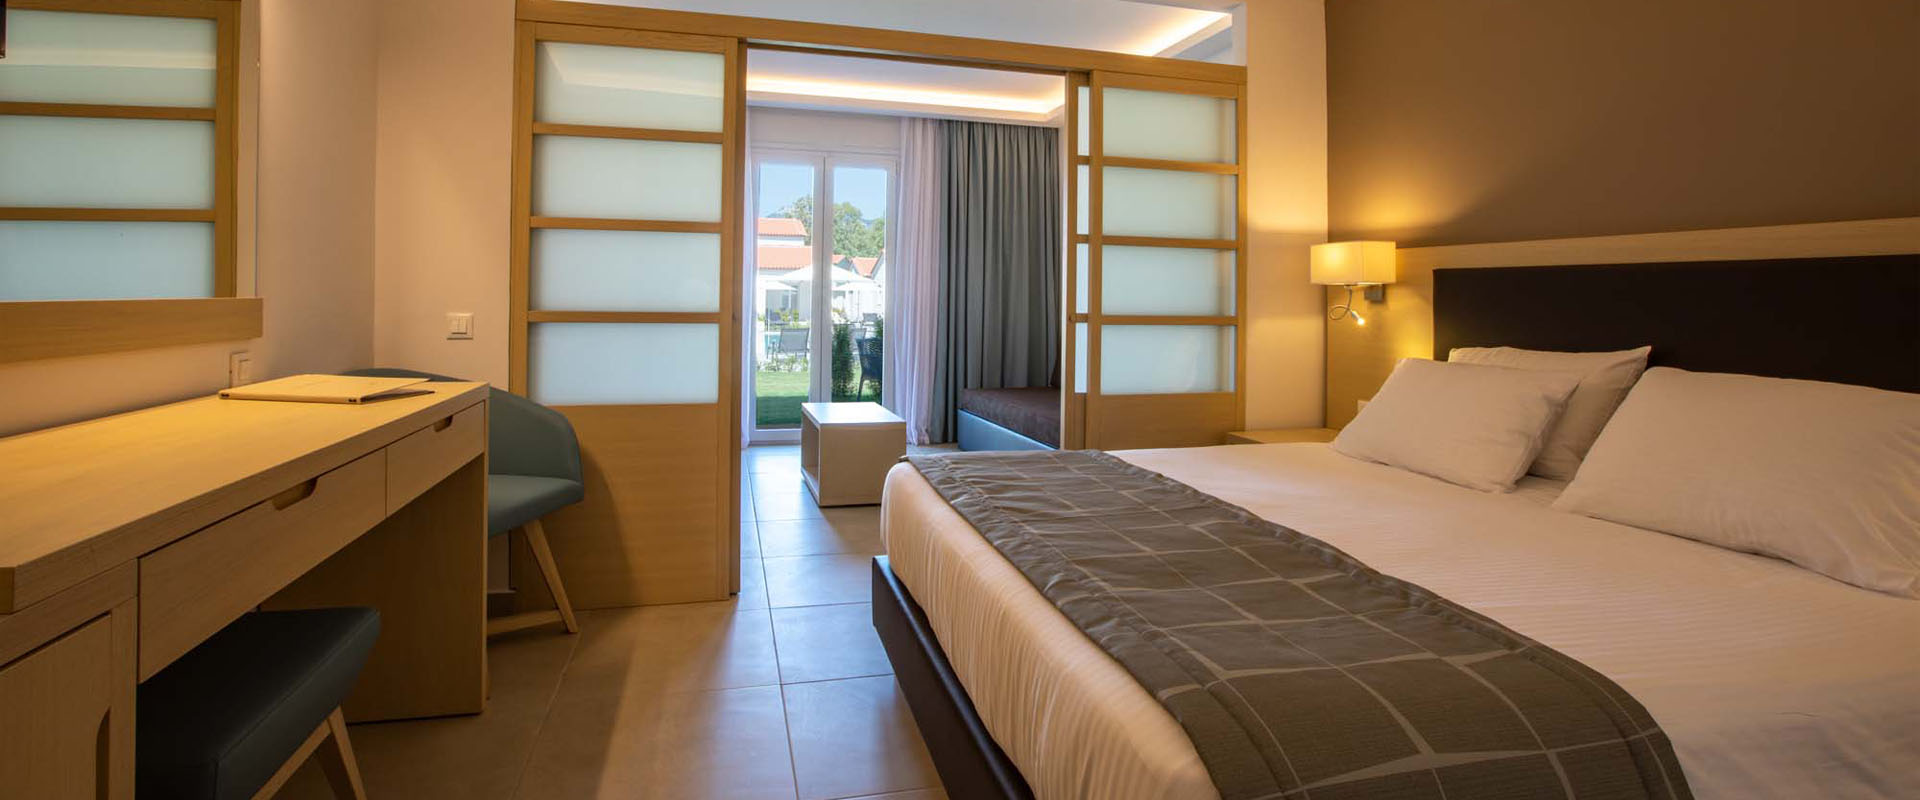 Paleros Beach Resort Luxury Hotel Family Room Slider